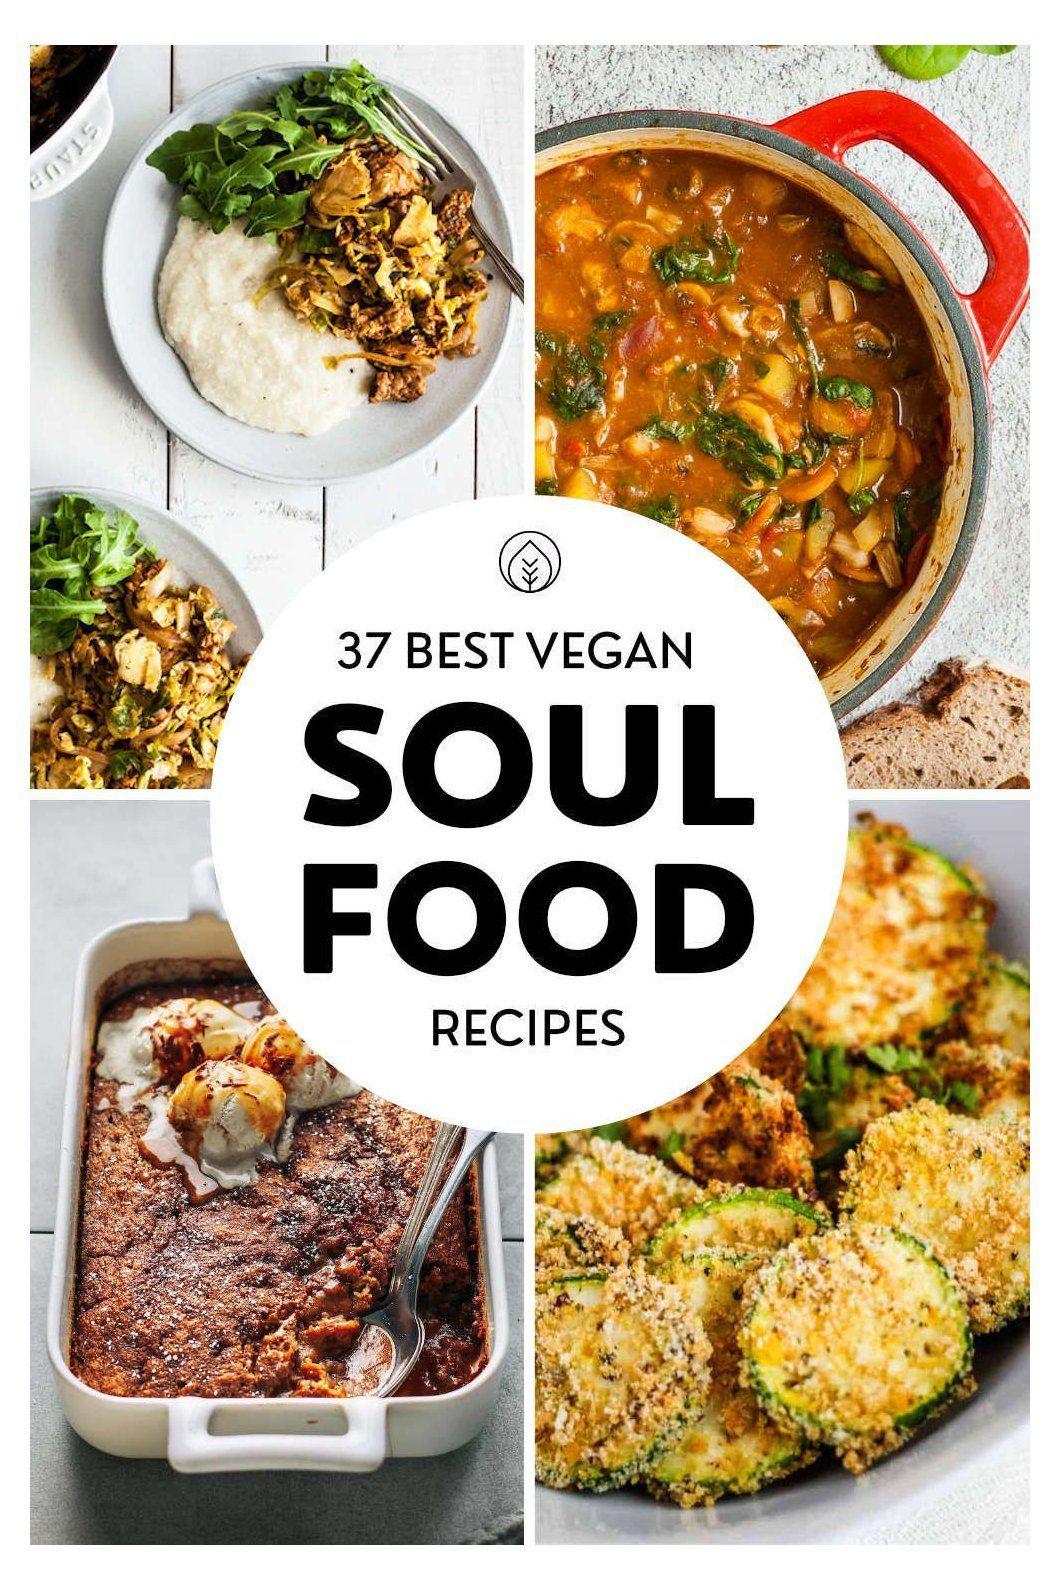 The Best Vegan Soul Food 37 Southern Inspired Comfort Recipes Find The Best Vegan Soul Food Recipes From Stews In 2020 Vegan Soul Food Vegan Dinner Recipes Soul Food